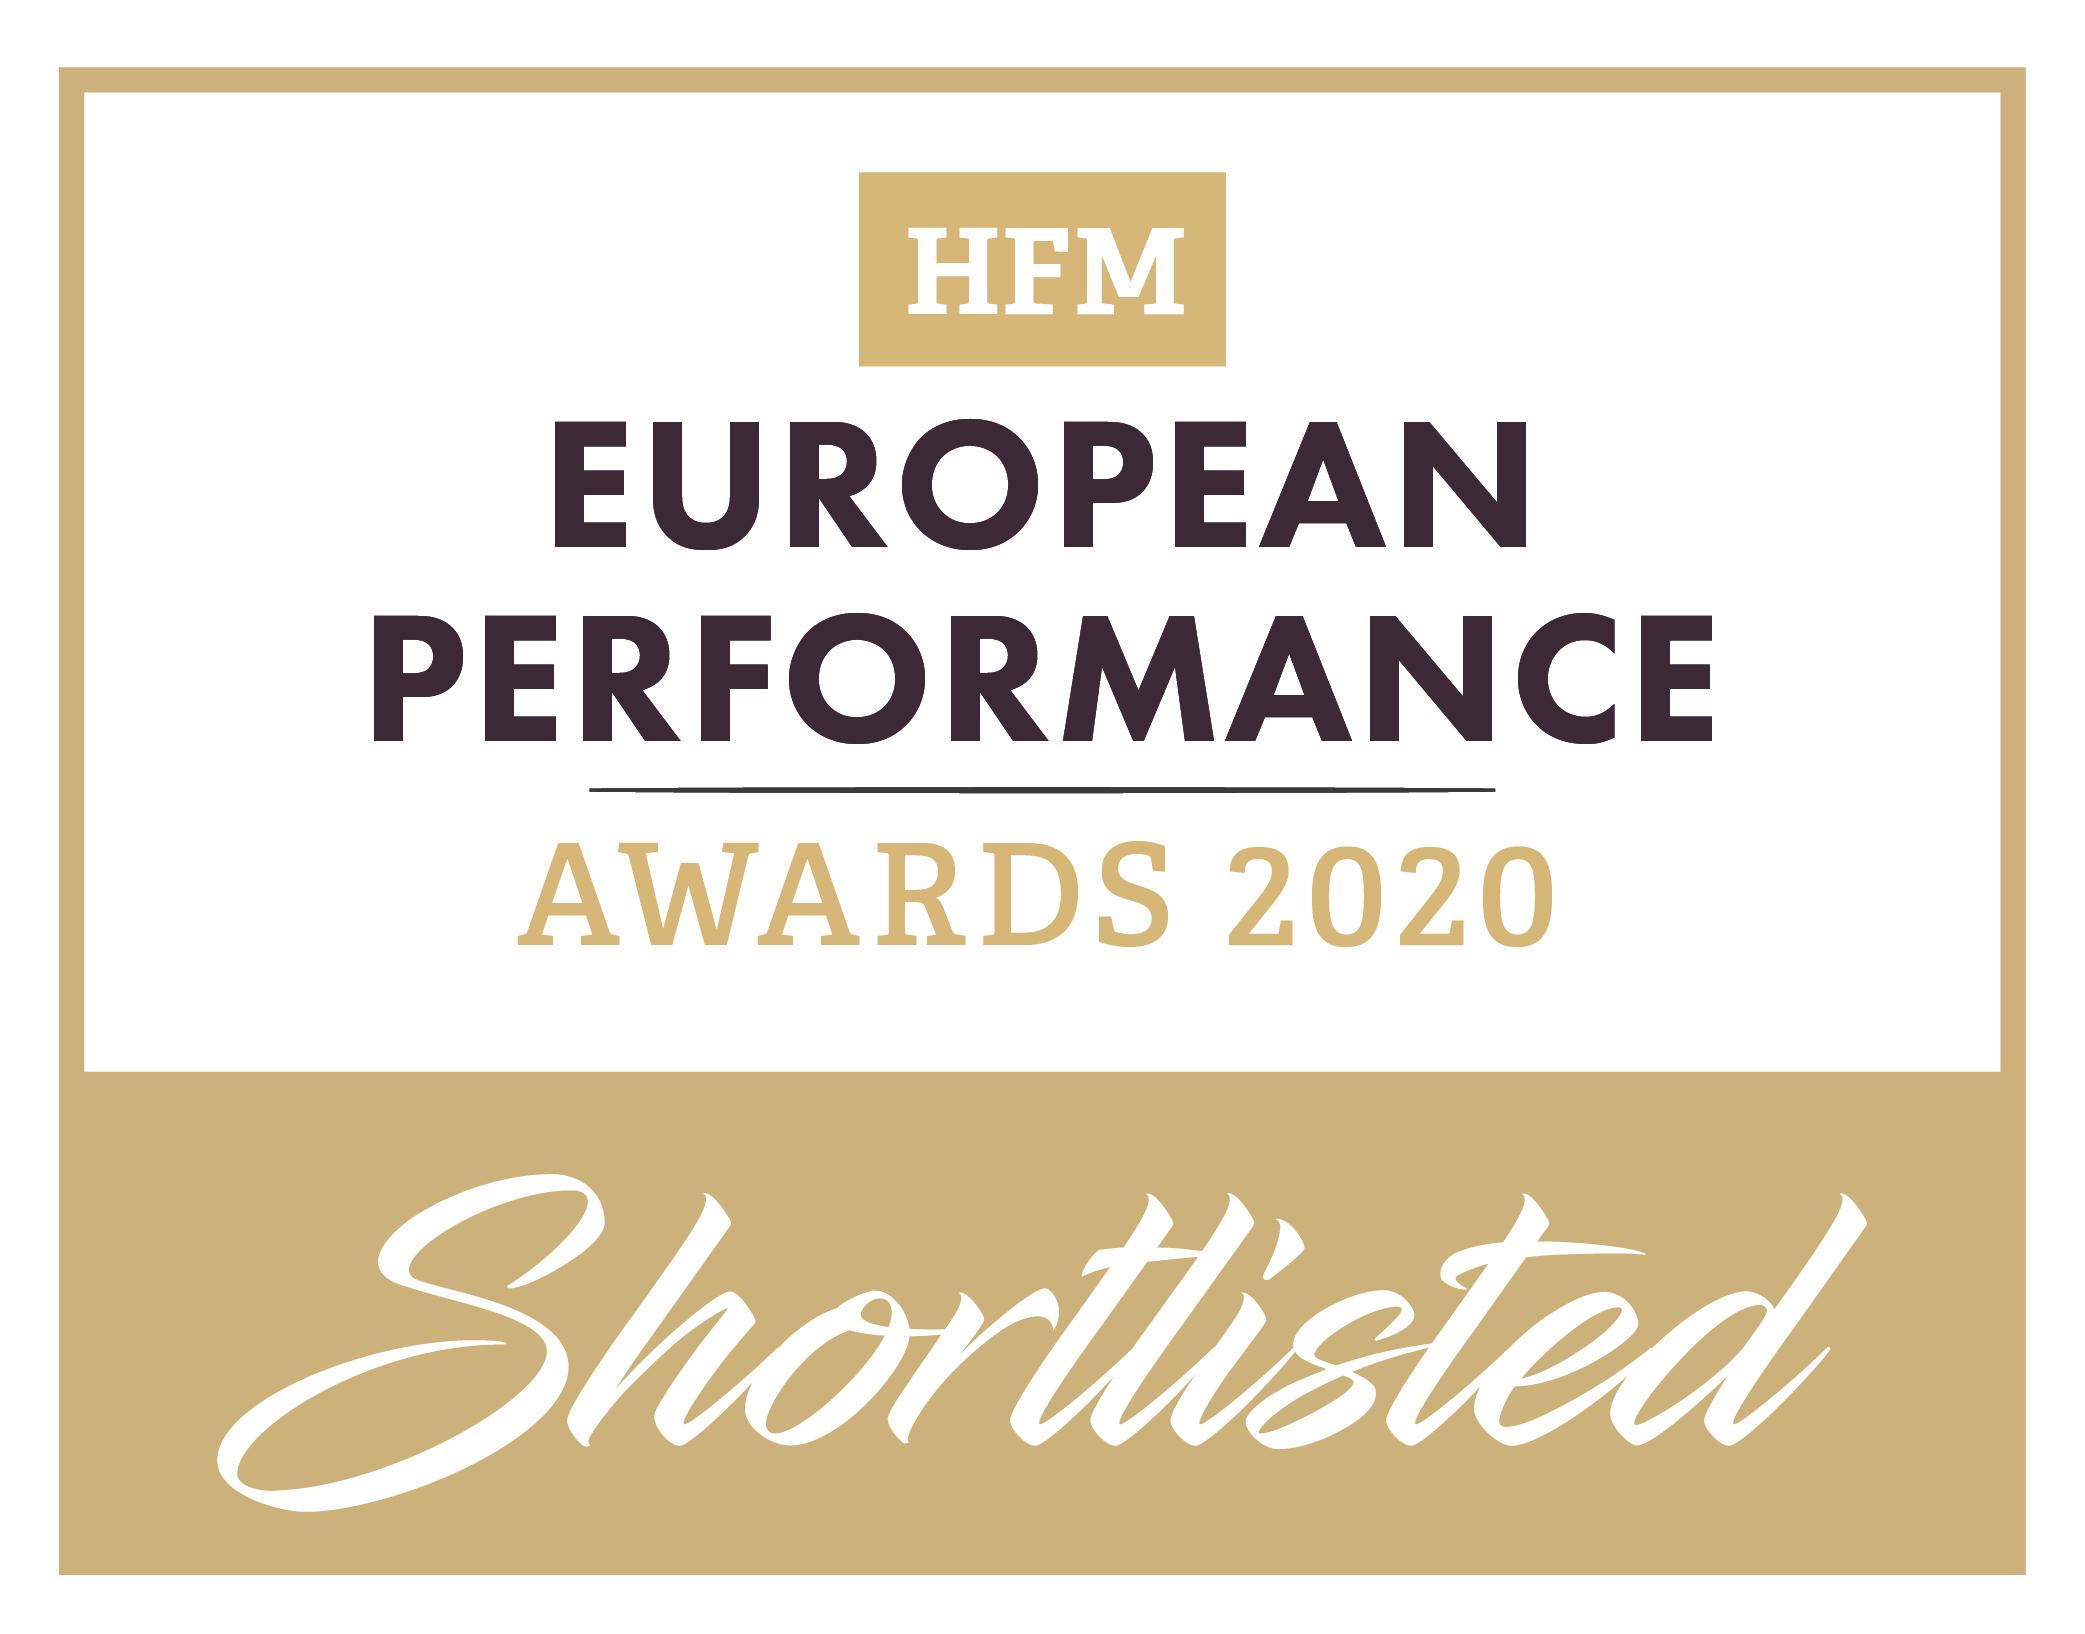 HFM European Performance Awards 2020